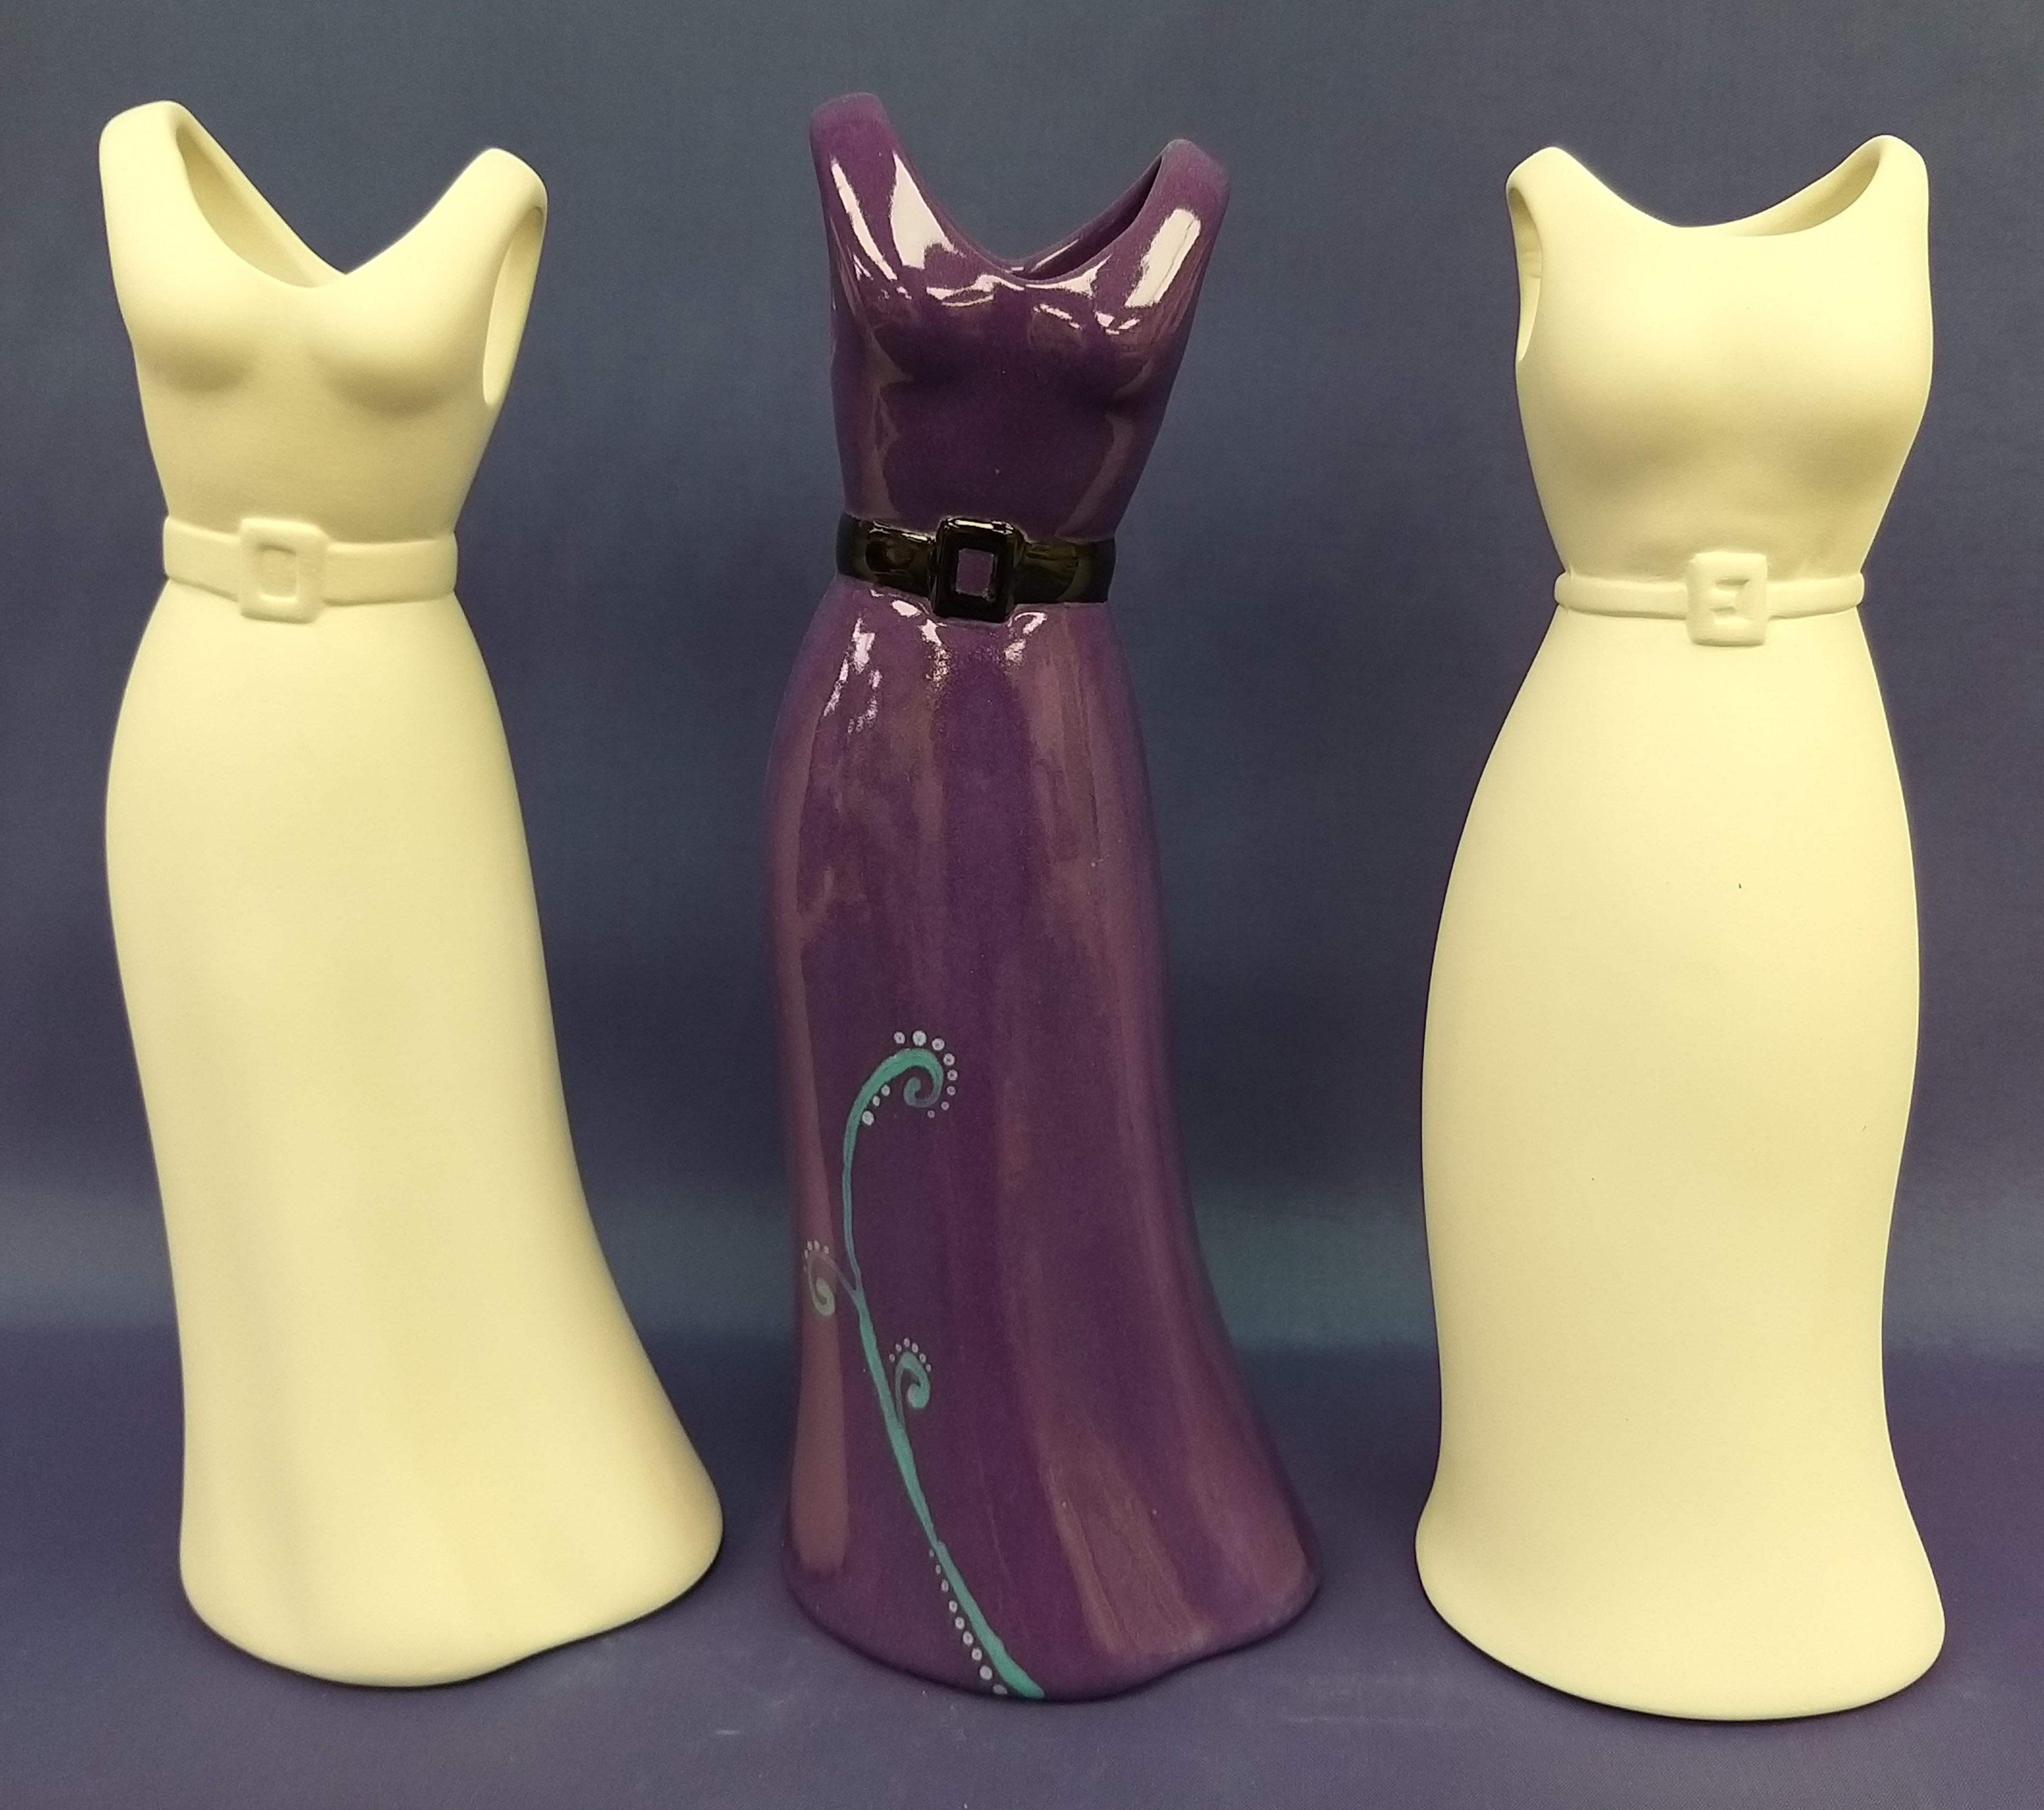 Dress Shaped Vase (Clear glaze inside)